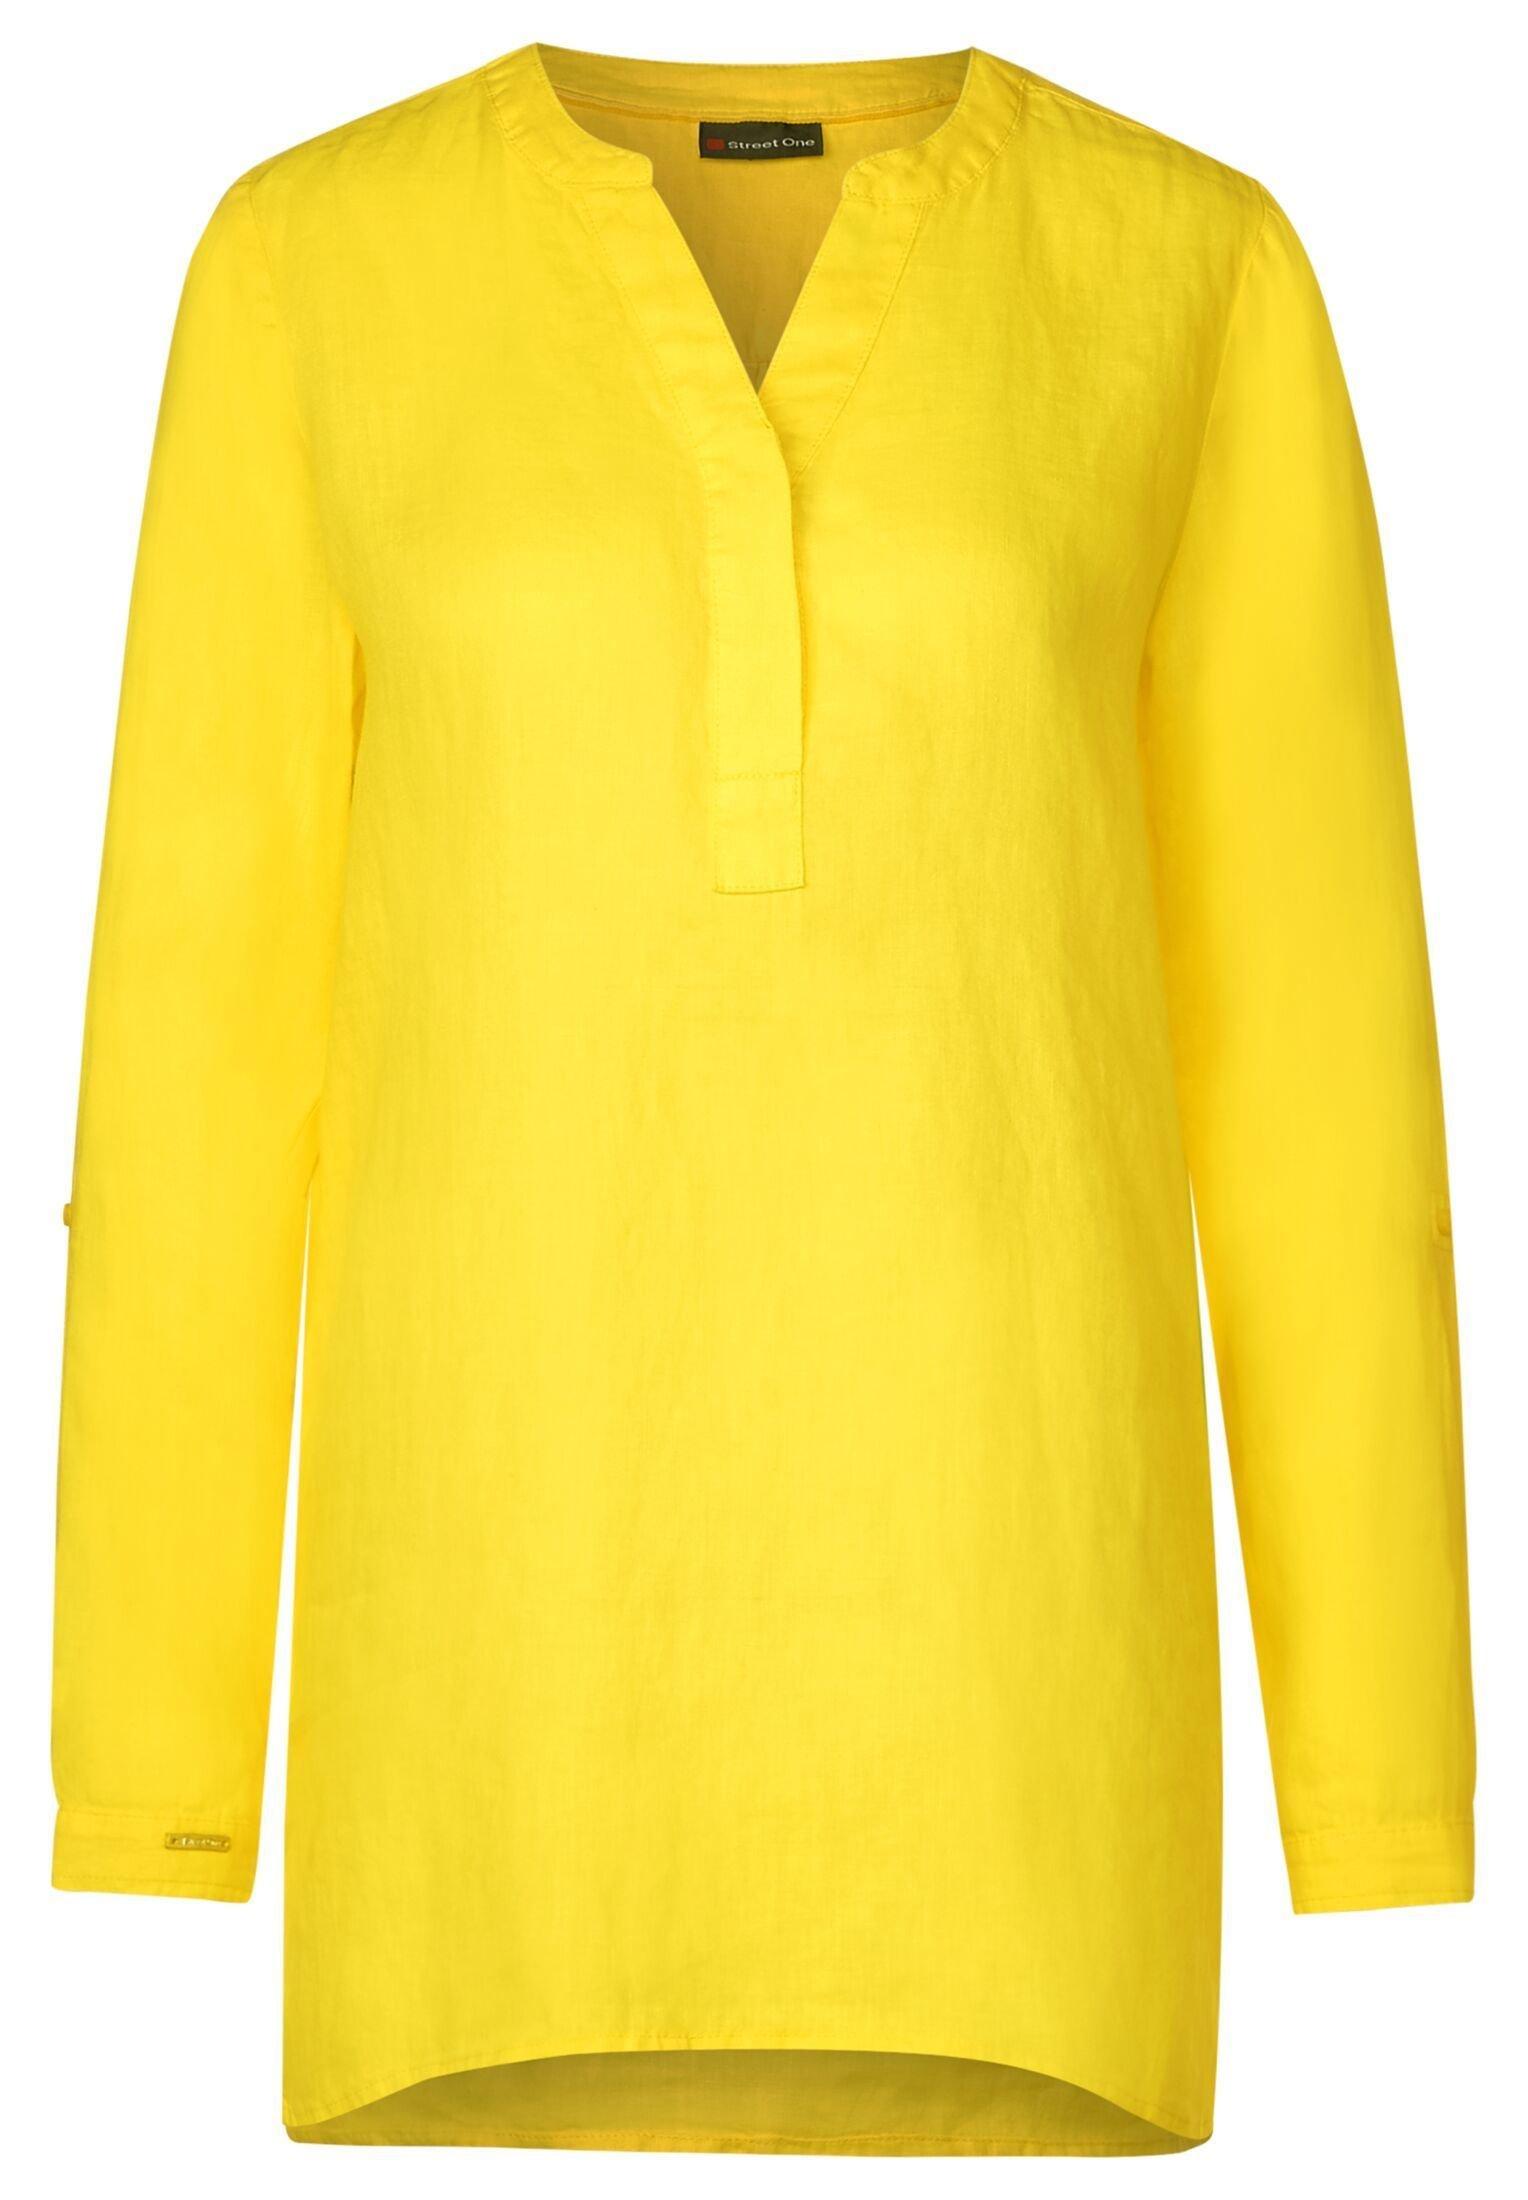 Polo-Shirt in Unifarbe in Mango Yellow CECIL